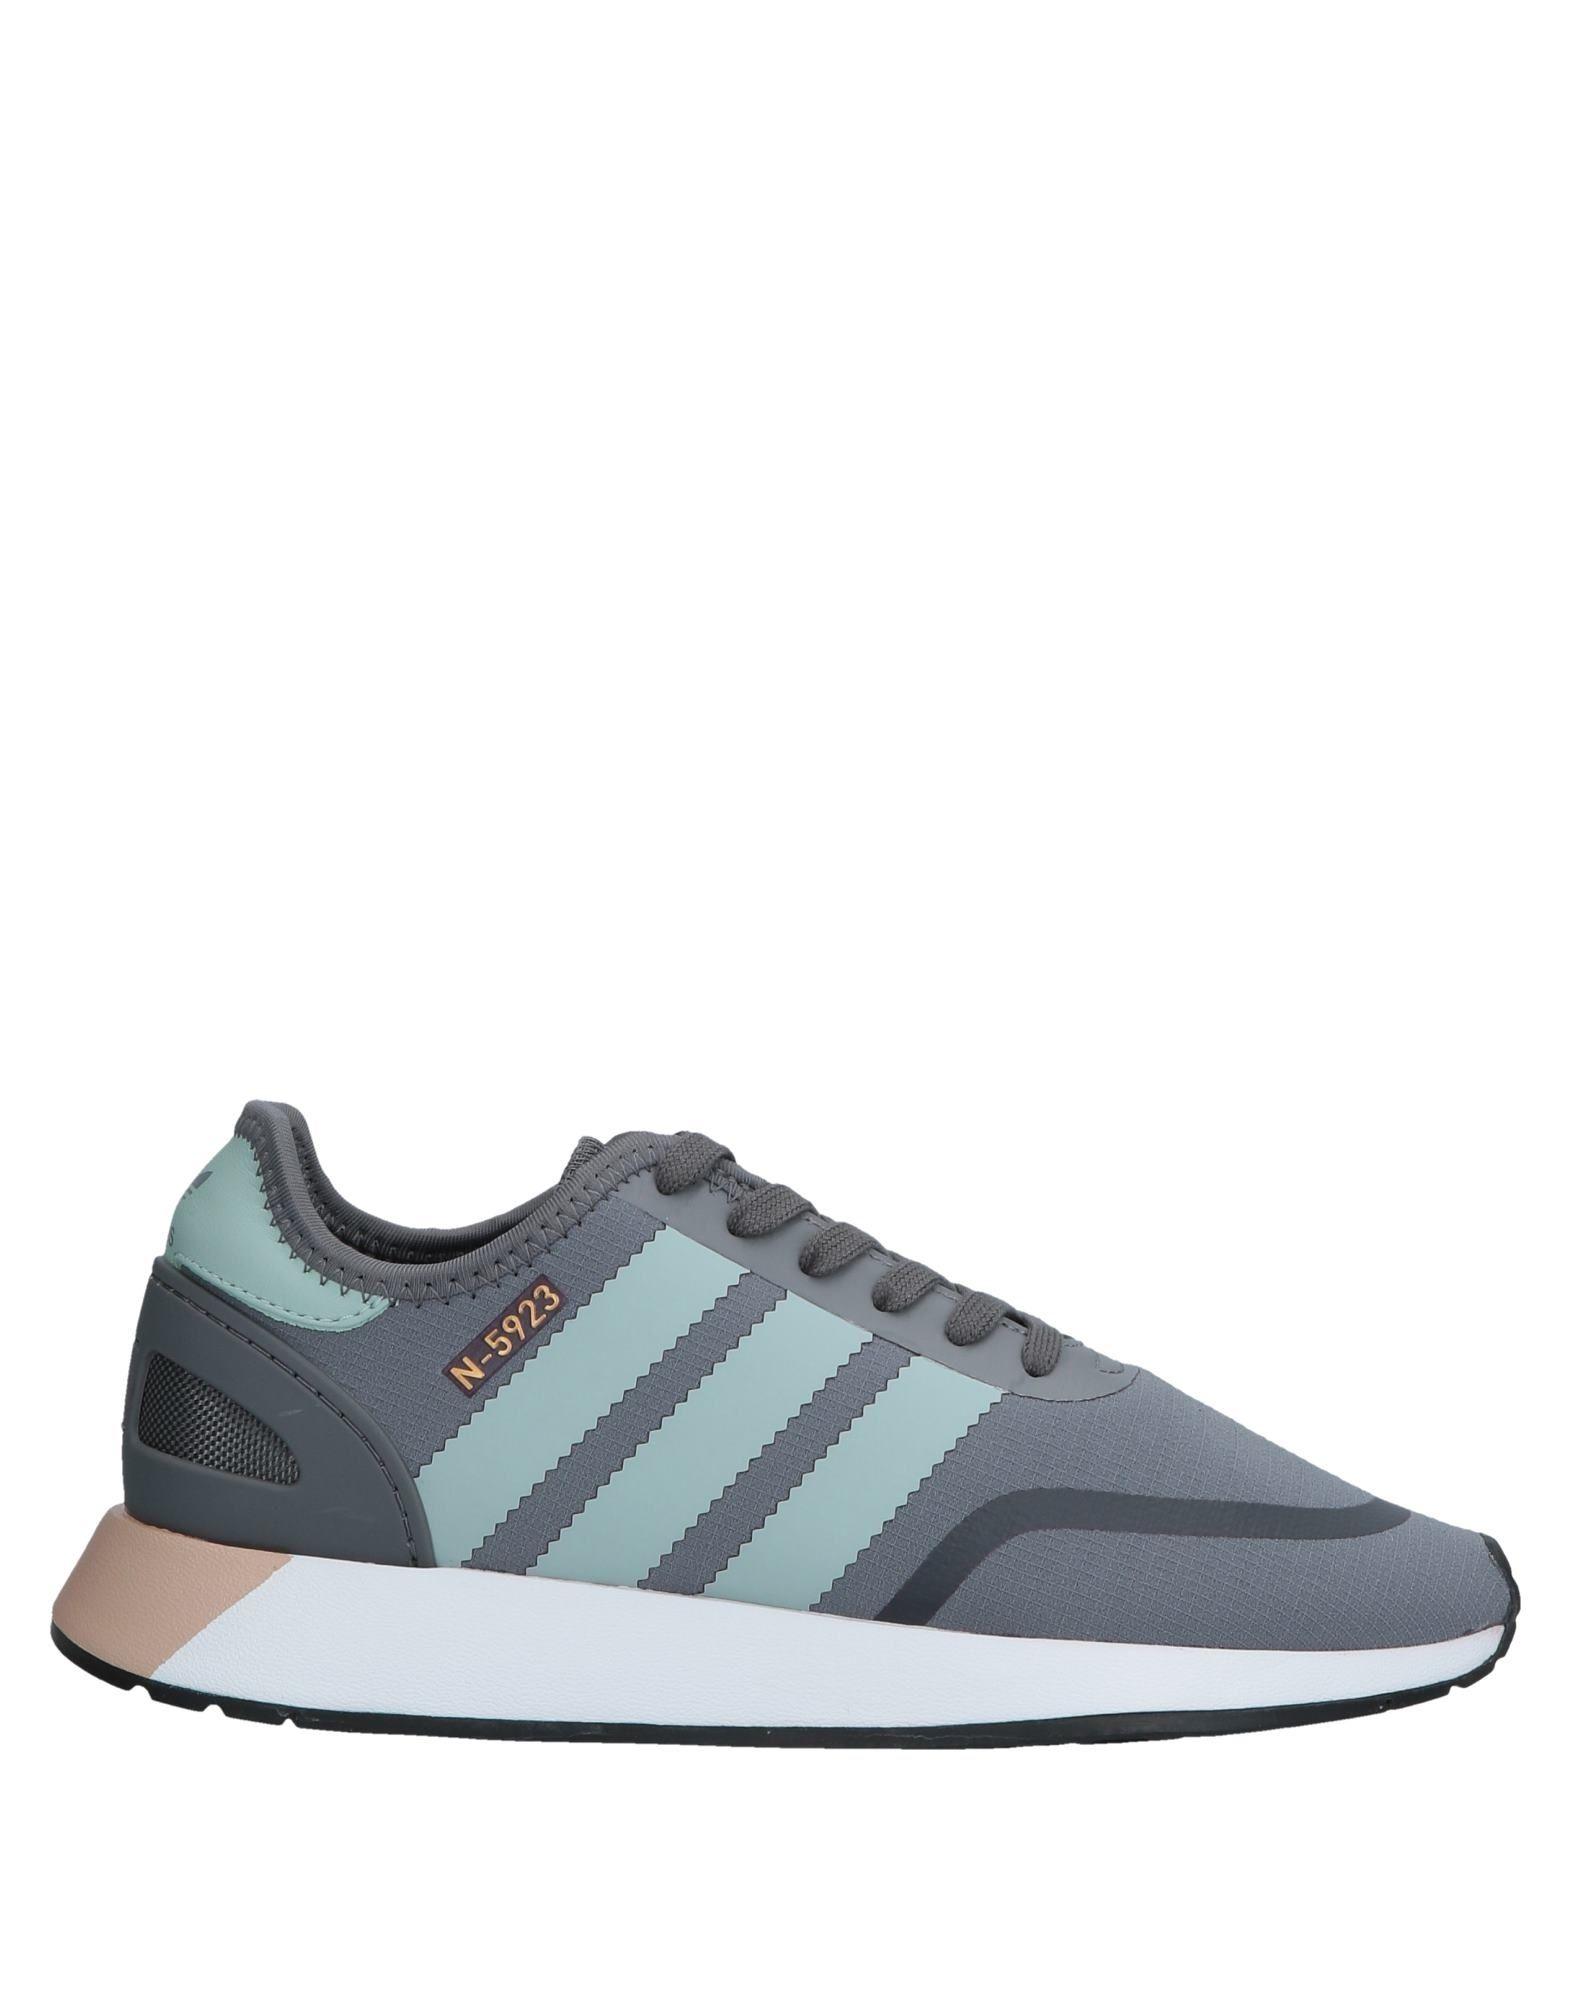 Adidas Originals Sneakers - Women Adidas  Originals Sneakers online on  Adidas United Kingdom - 11561755LV 29764a